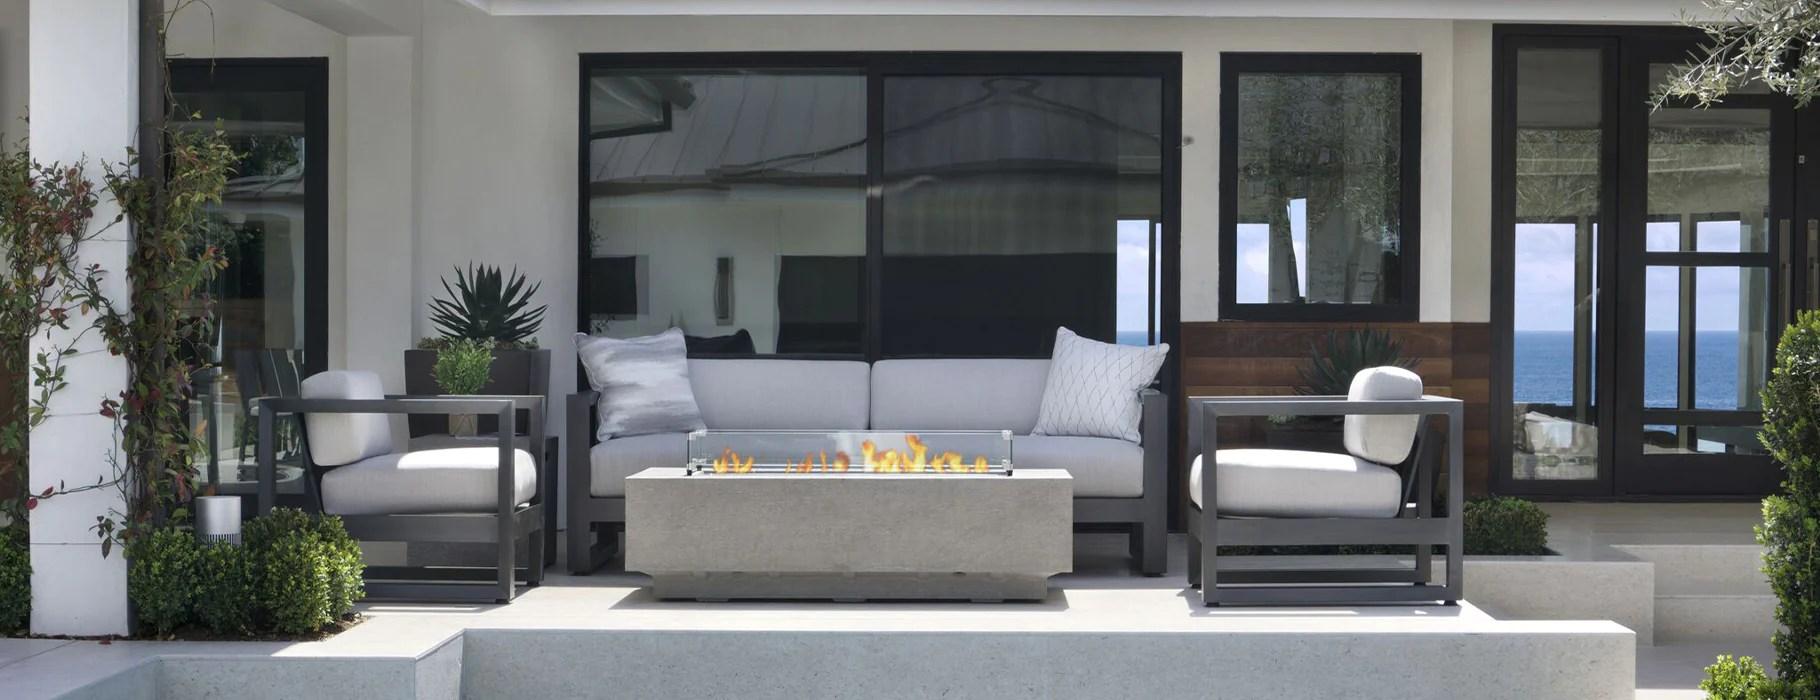 luxury outdoor furniture sunset west